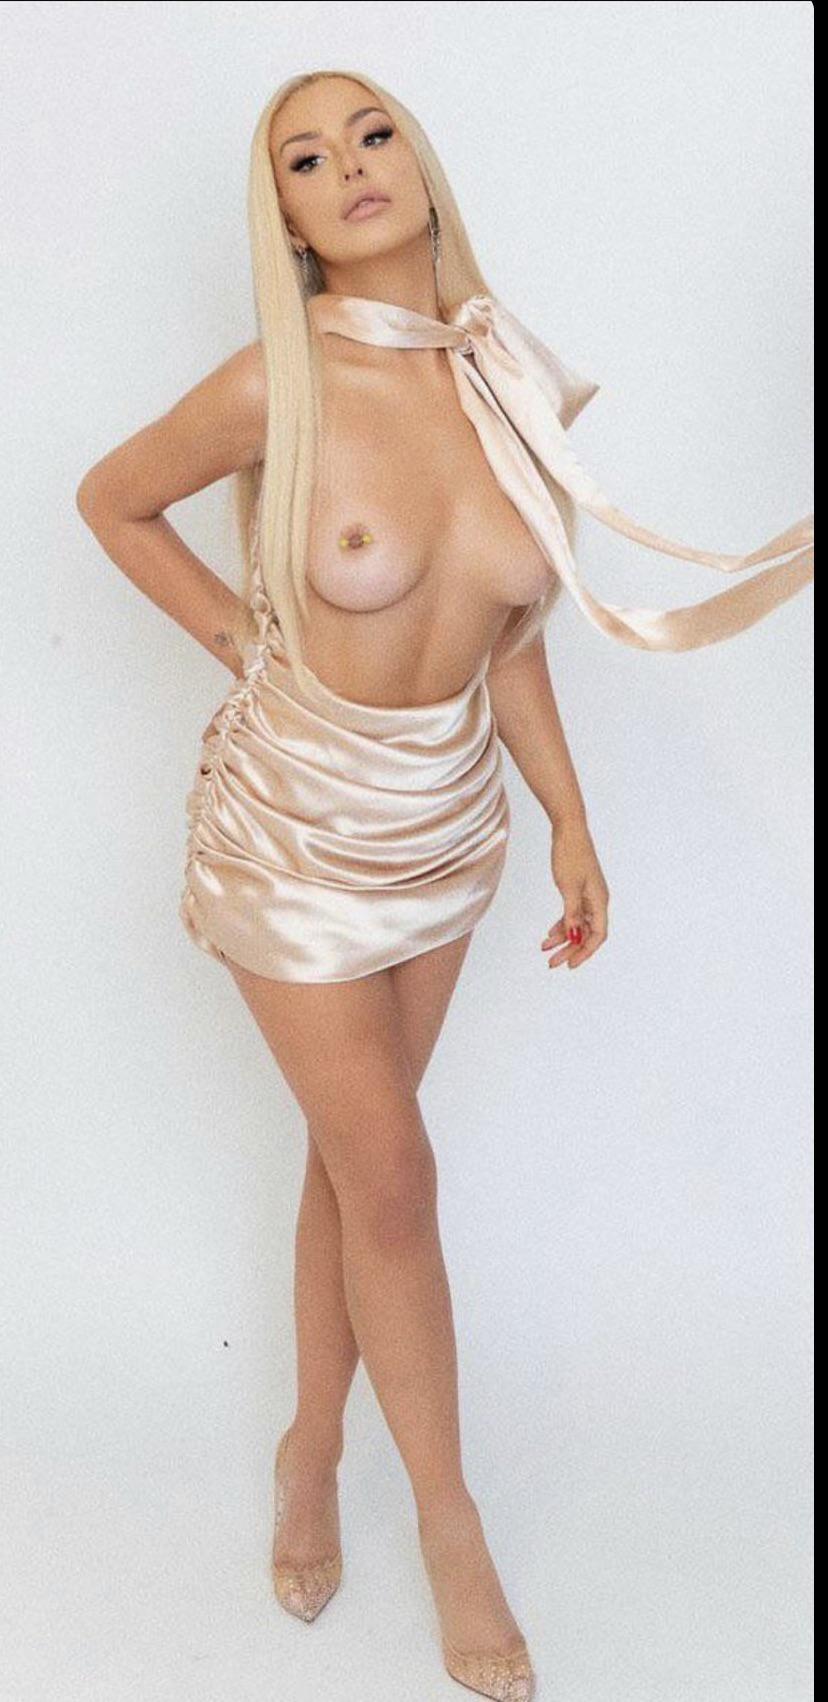 Tana Mongeau Nude Onlyfans Leaked 0012